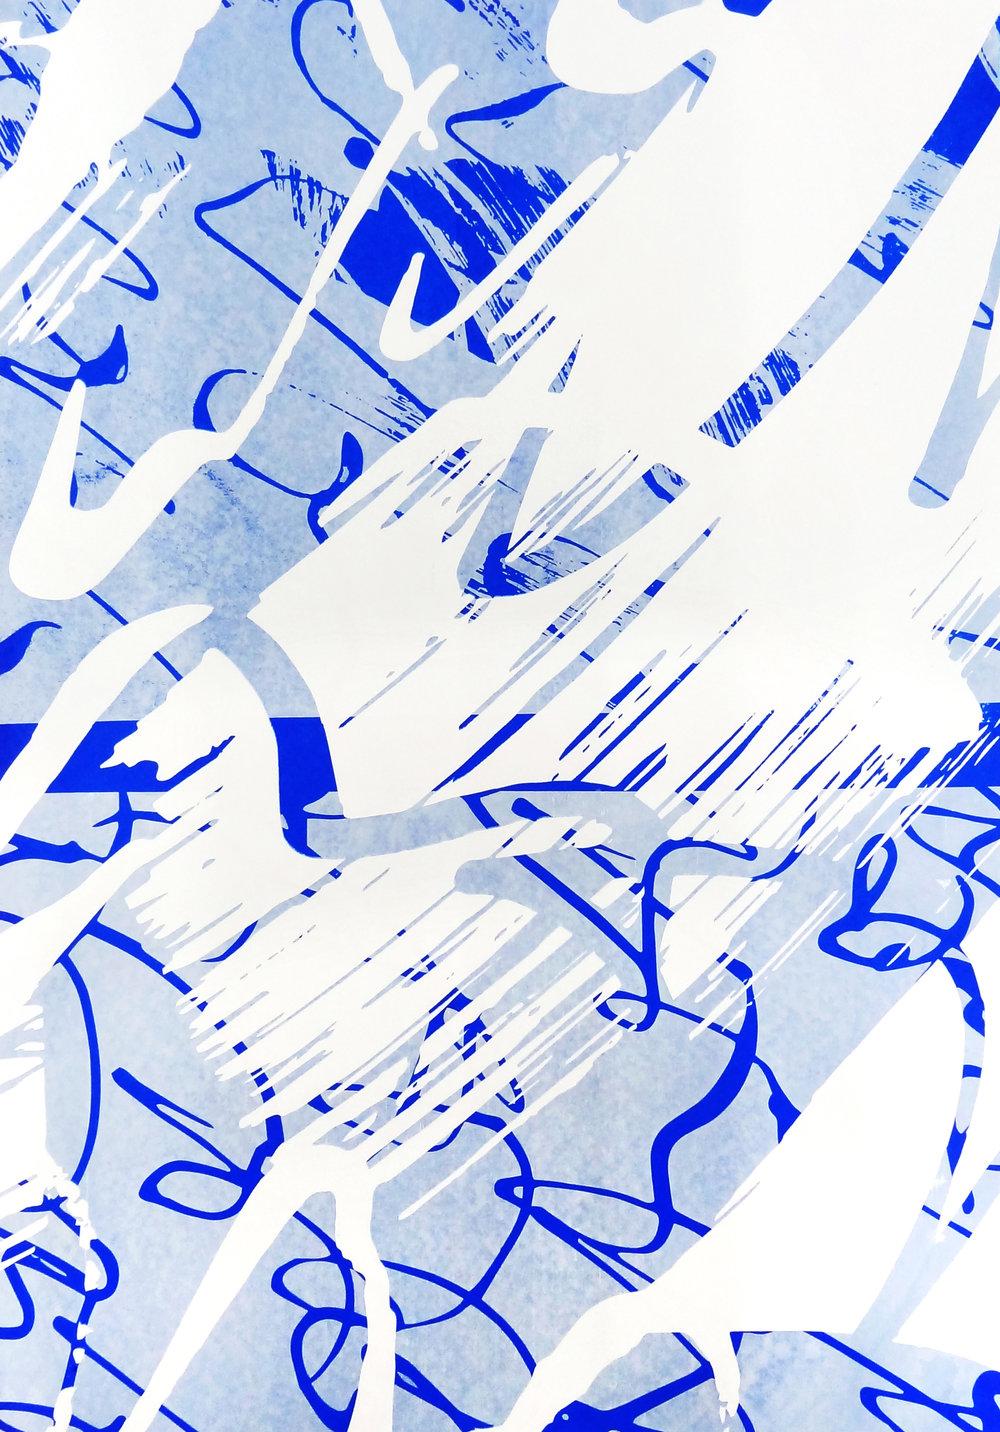 Untitled, 2018 acrylic on paper one-off screenprint 57 x 40 cm (26-18)